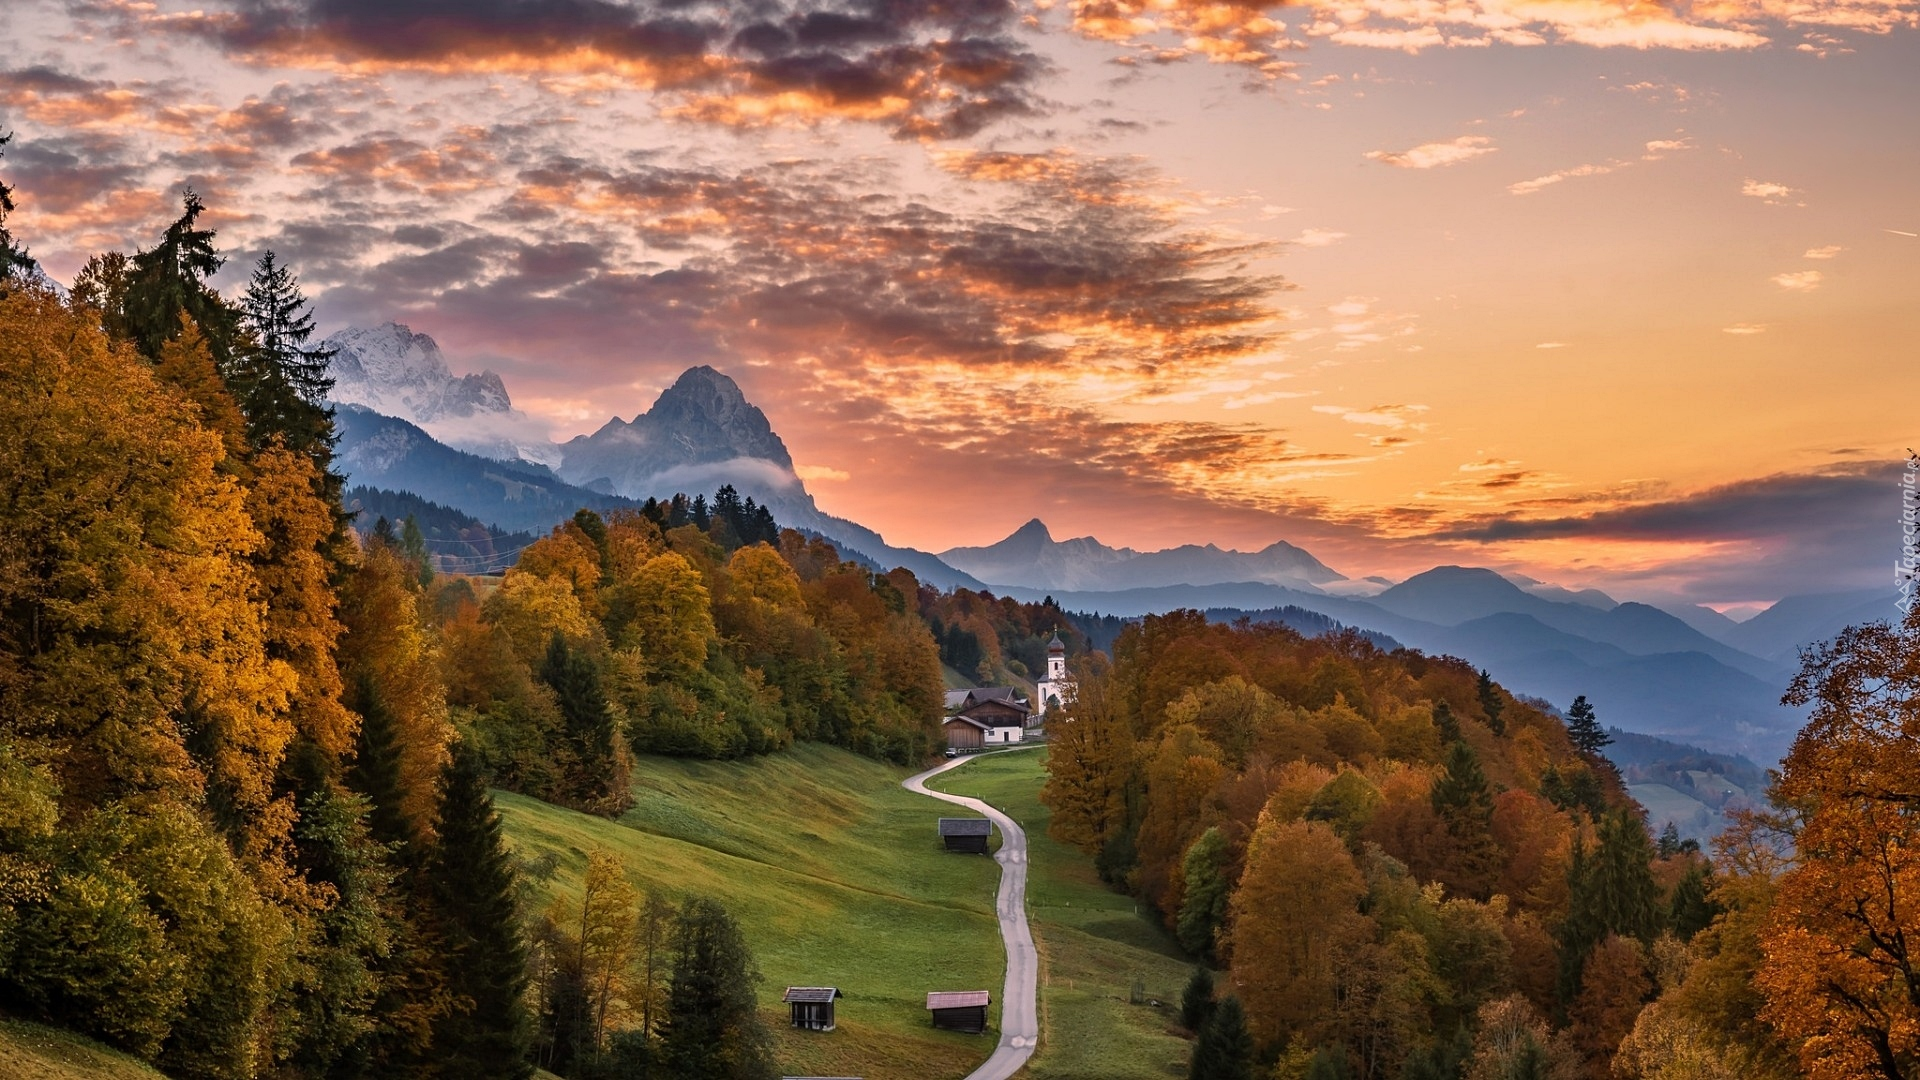 Fall Mountain Scenery Wallpaper Tapety Niemcy